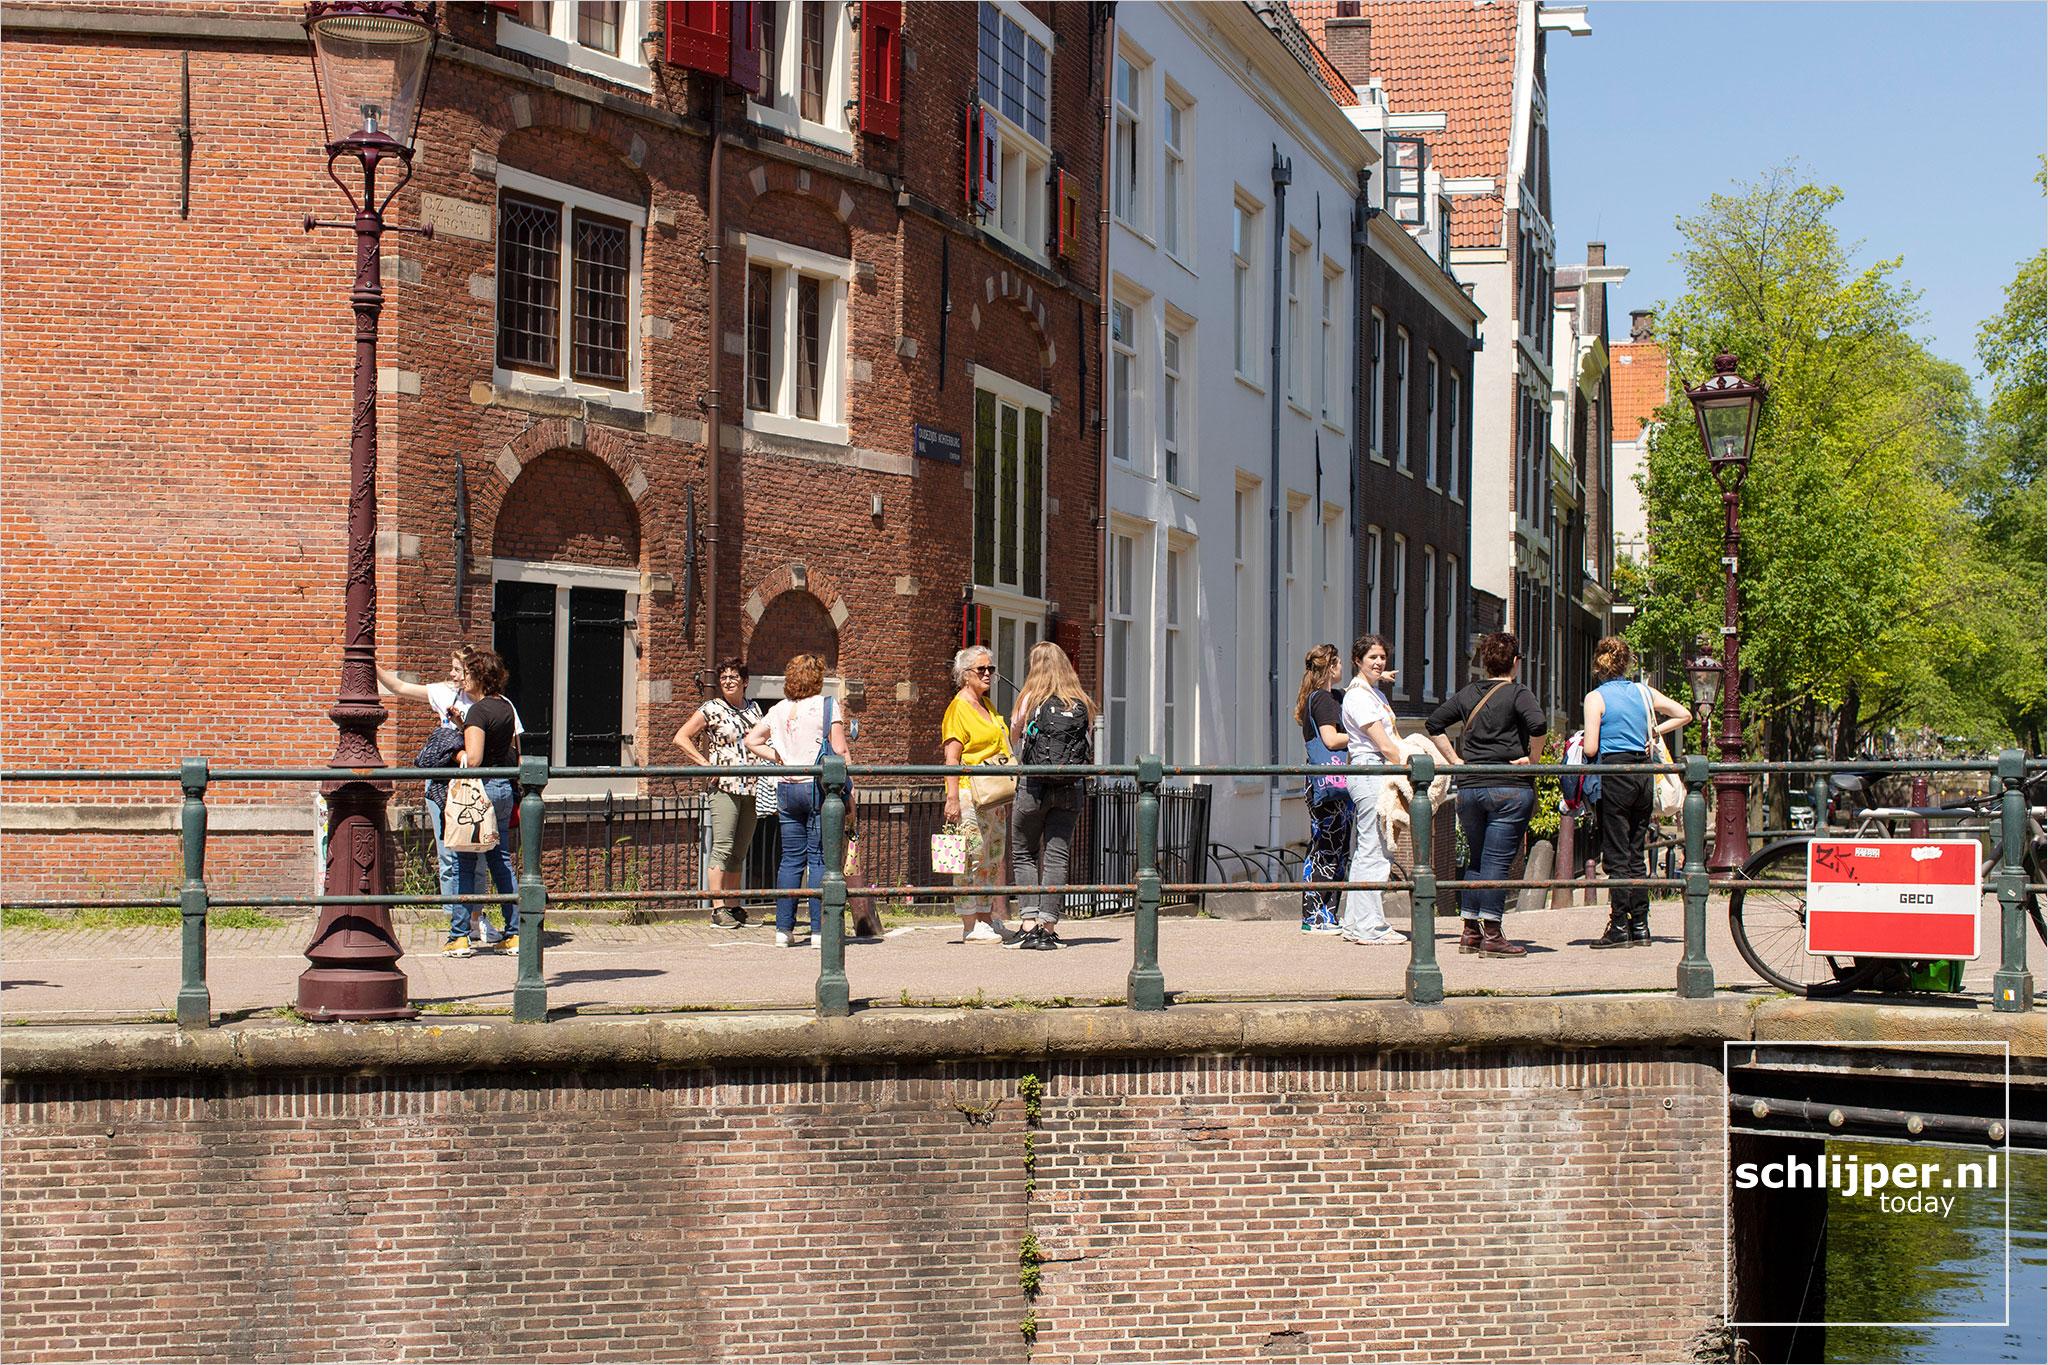 The Netherlands, Amsterdam, 30 mei 2021